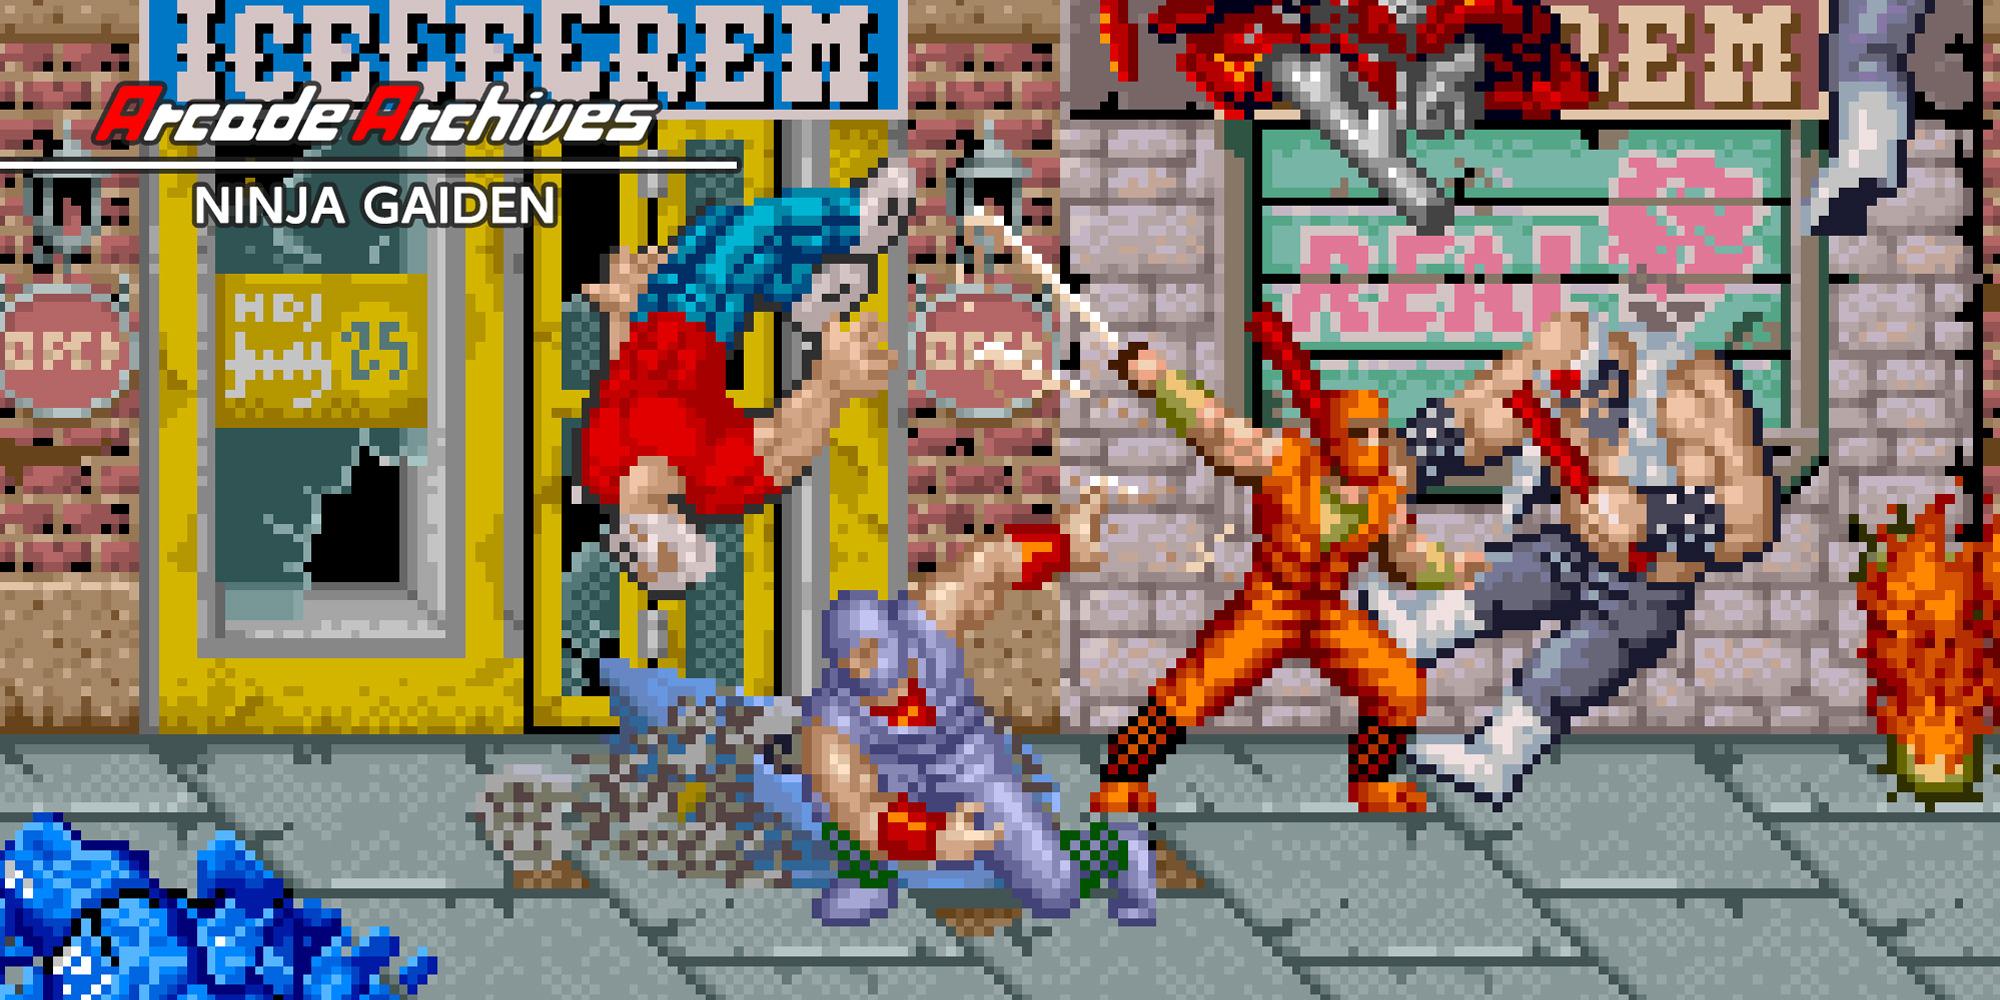 Arcade Archives NINJA GAIDEN | Nintendo Switch download software | Games |  Nintendo